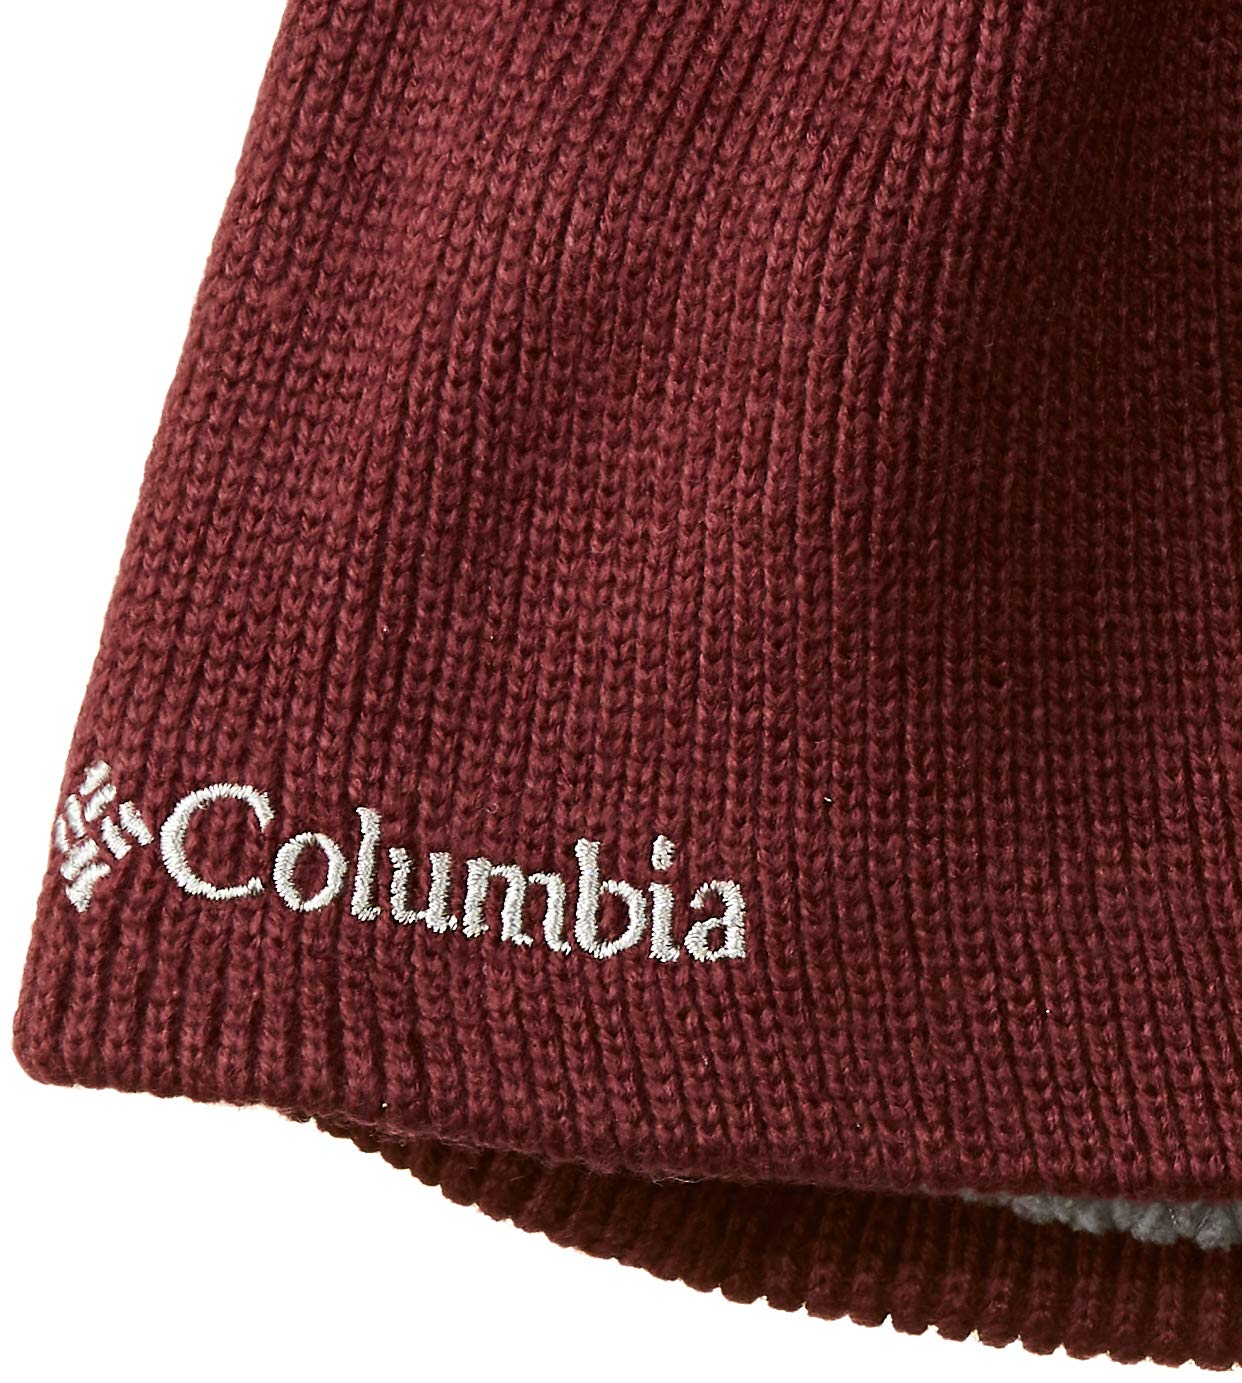 Columbia Bugaboo Beanie Headwear Hat